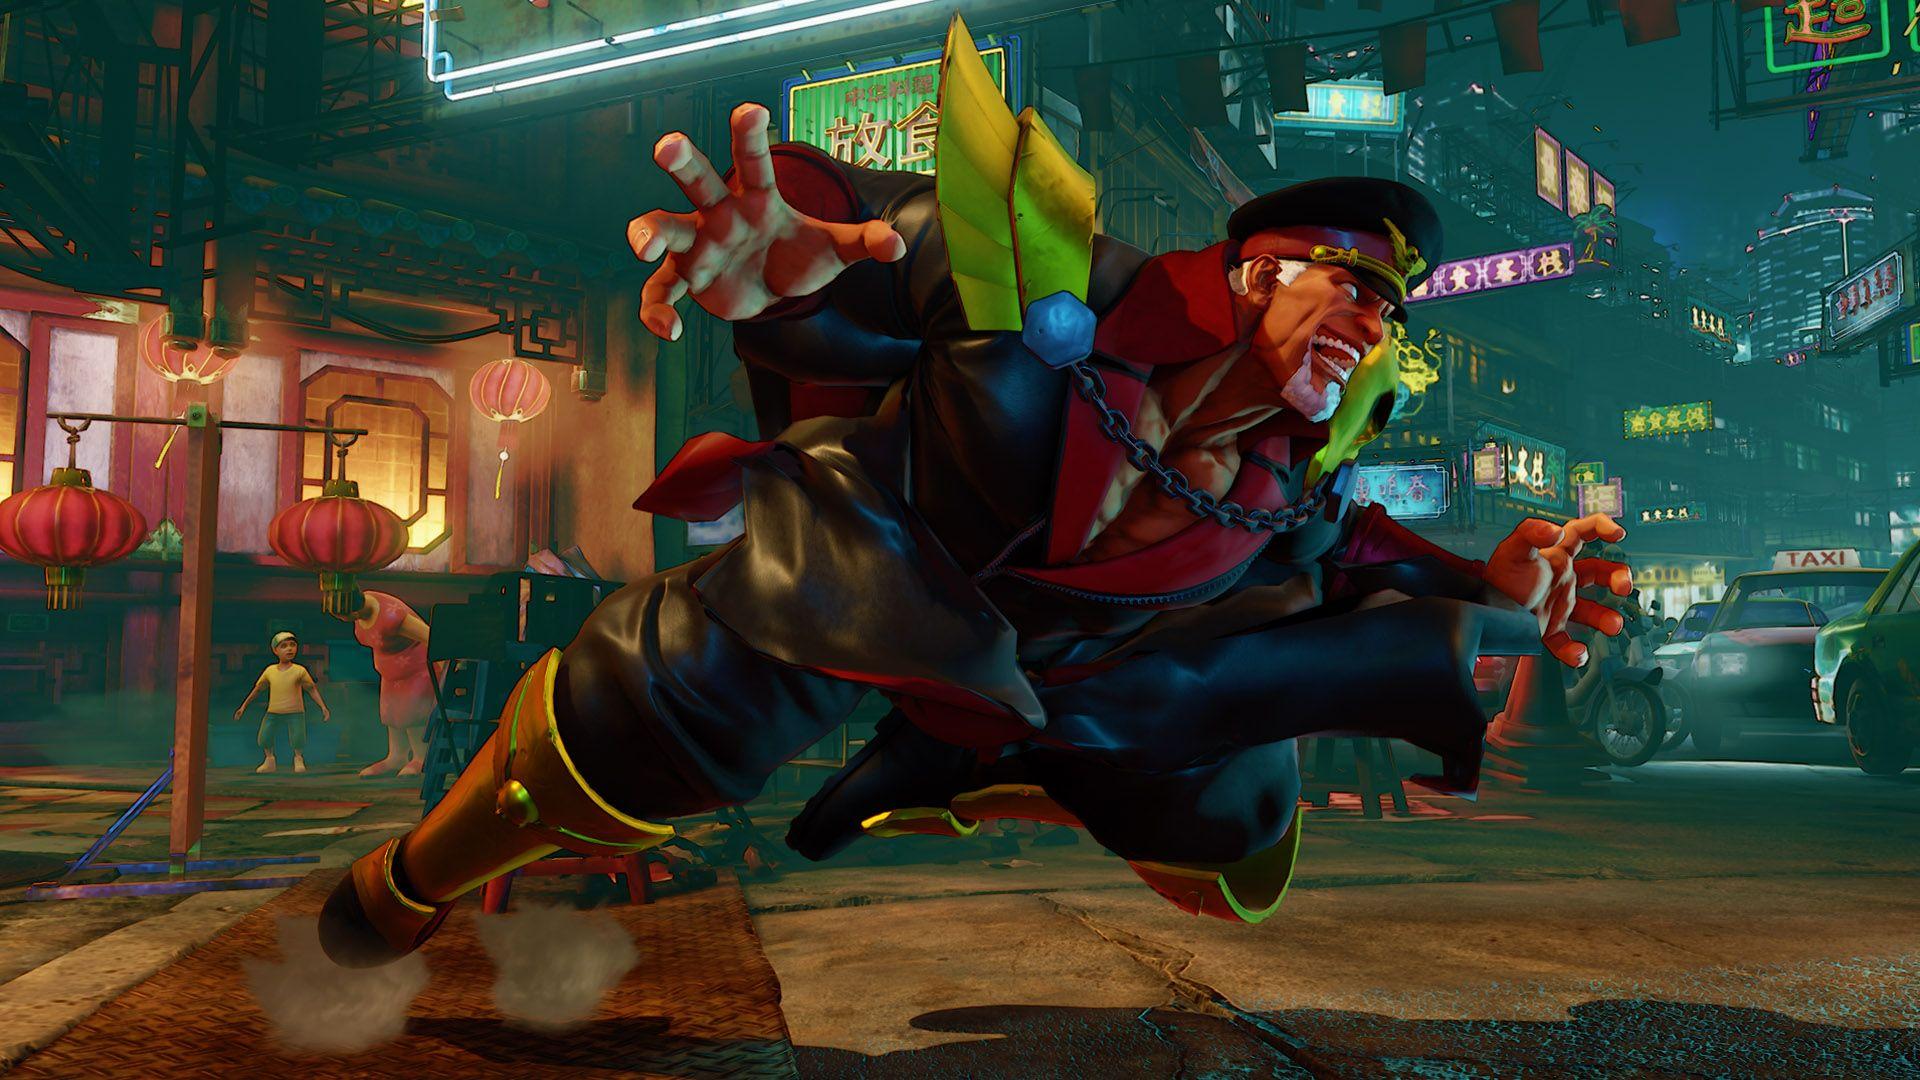 open in a new window game art pinterest street fighter chun